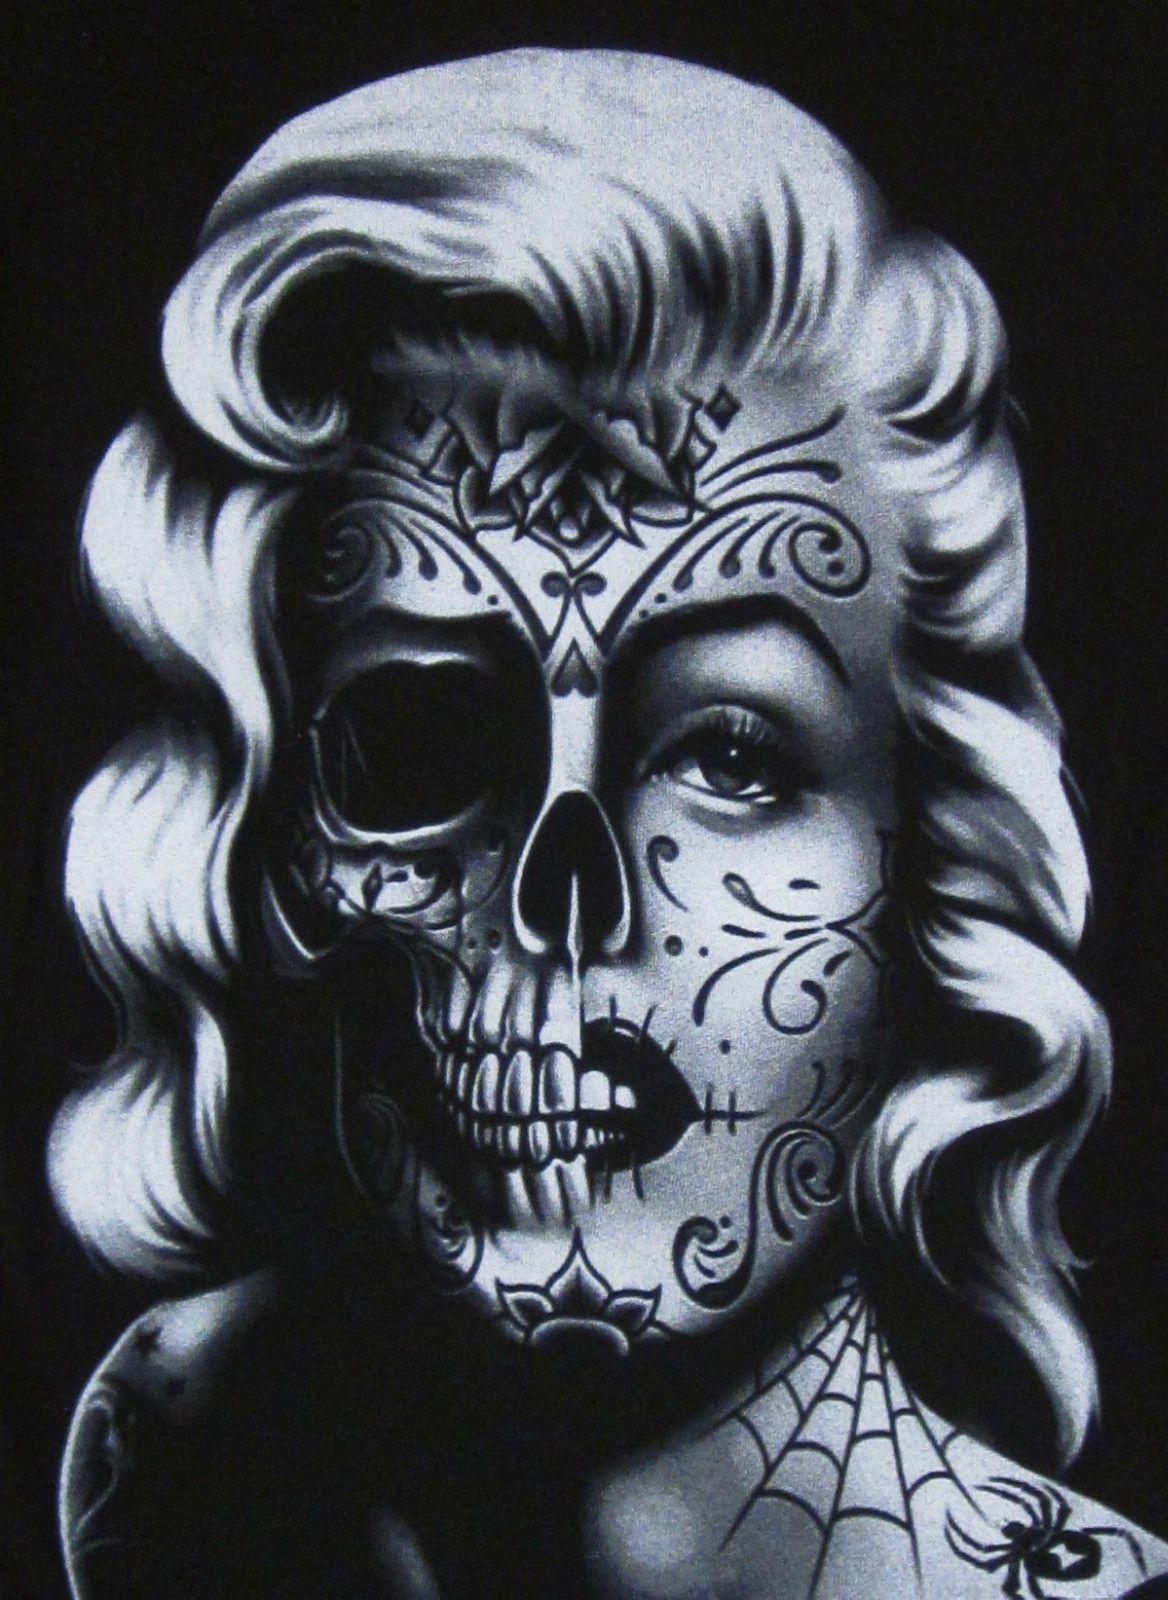 Women Marilyn Monroe Skull Zombie Face Body Skeleton Tattoo Adult T